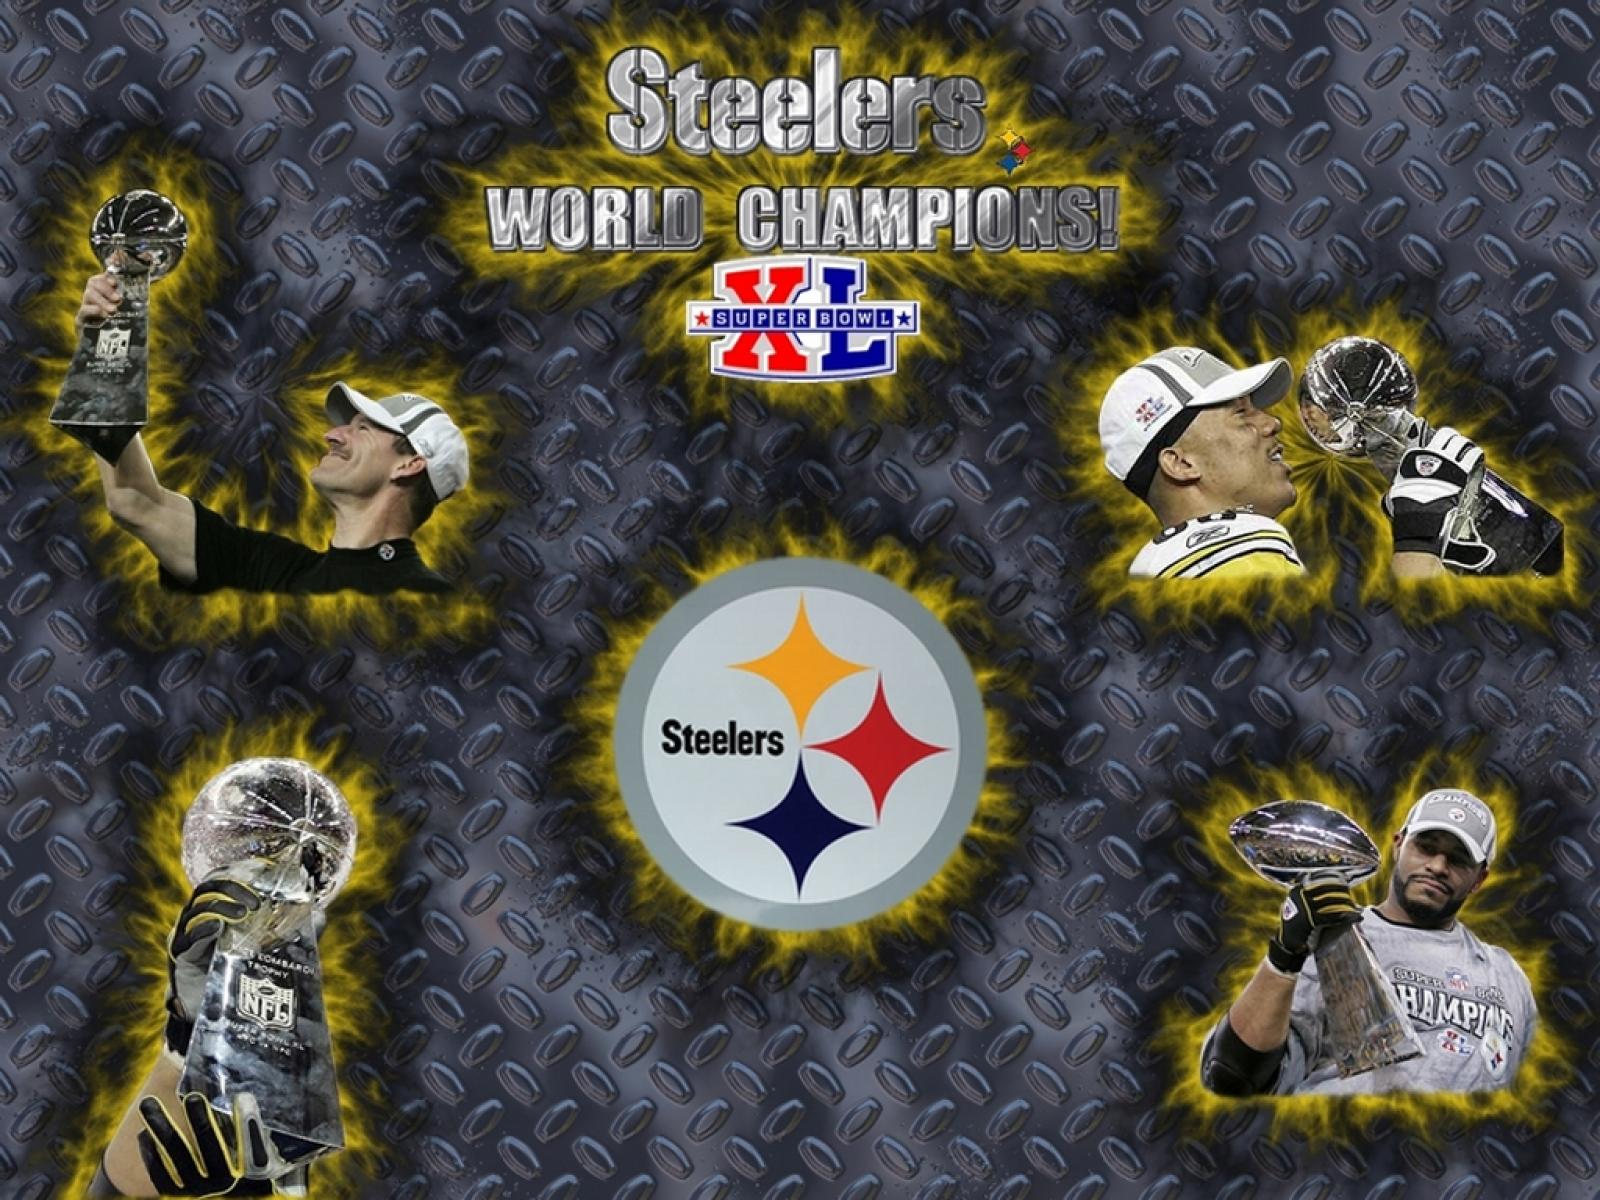 Steelers world champions wallpaper by wallpaperistcom 1600x1200